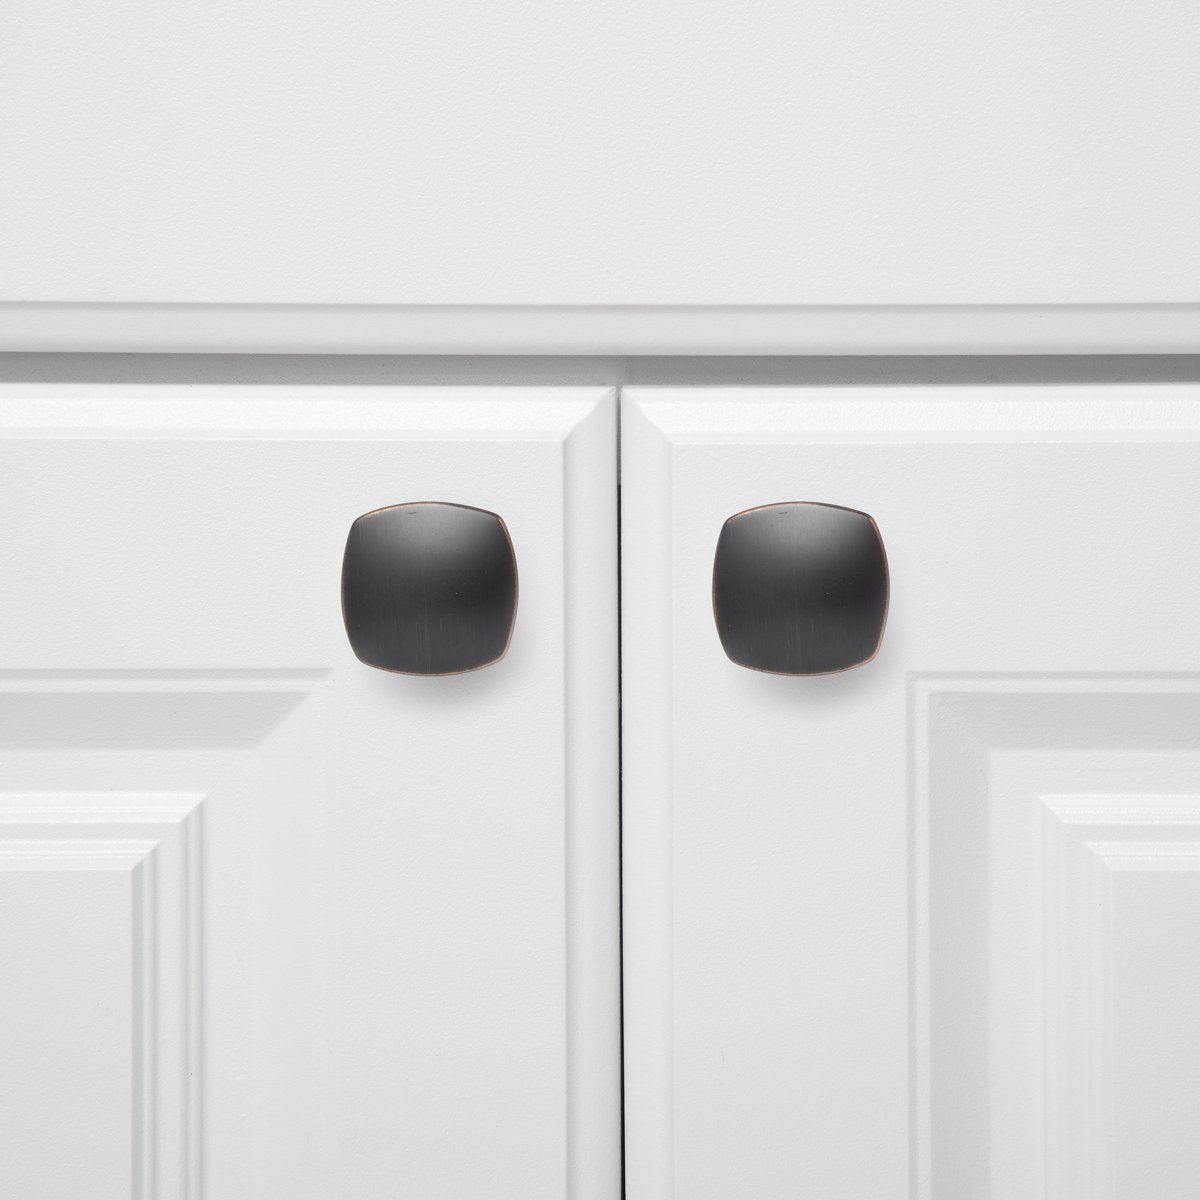 10-Pack Satin Nickel Basics Rounded Square Cabinet Knob 1.26 Diameter